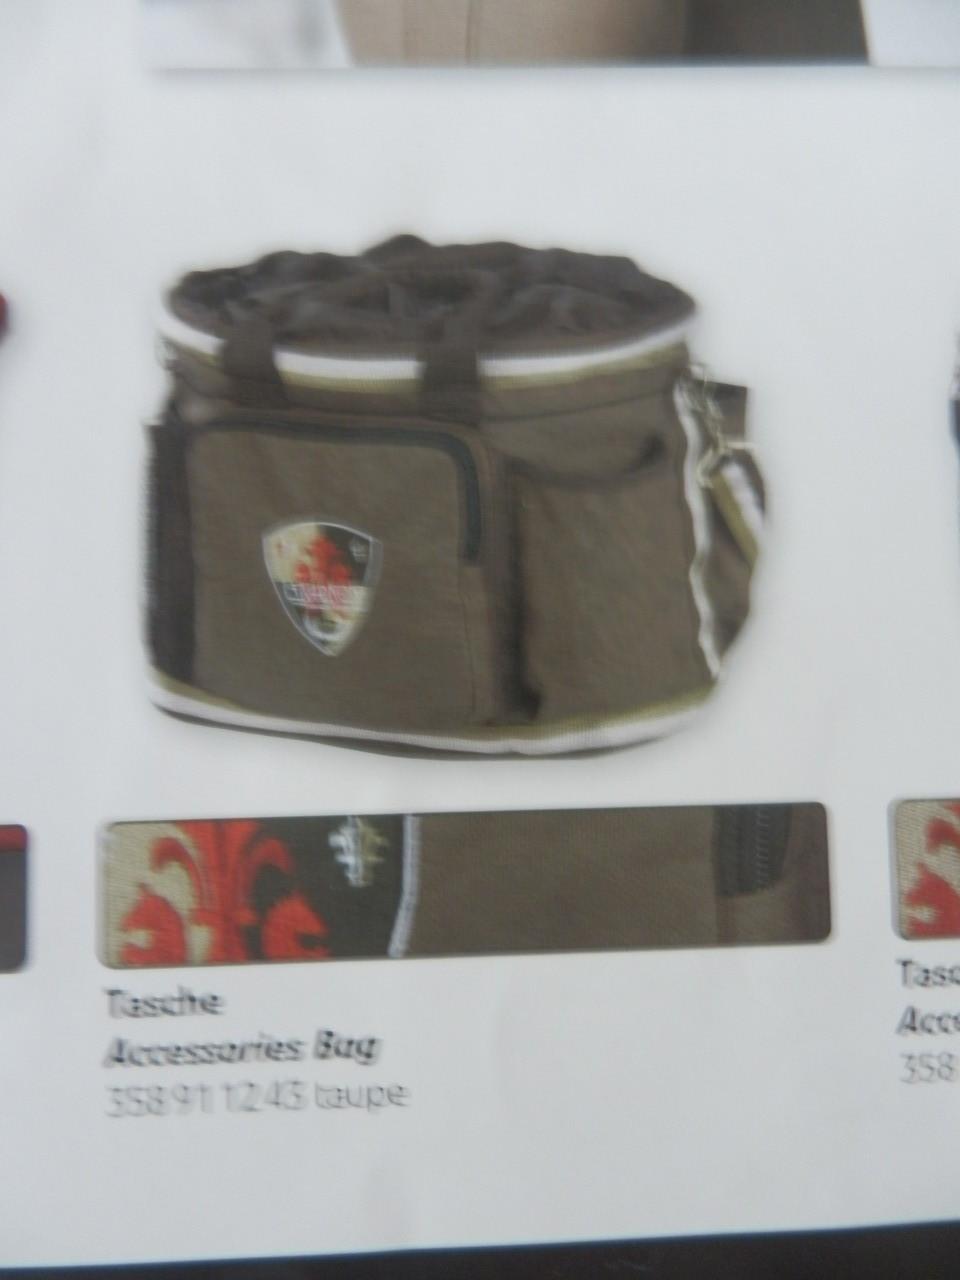 accessories Bag